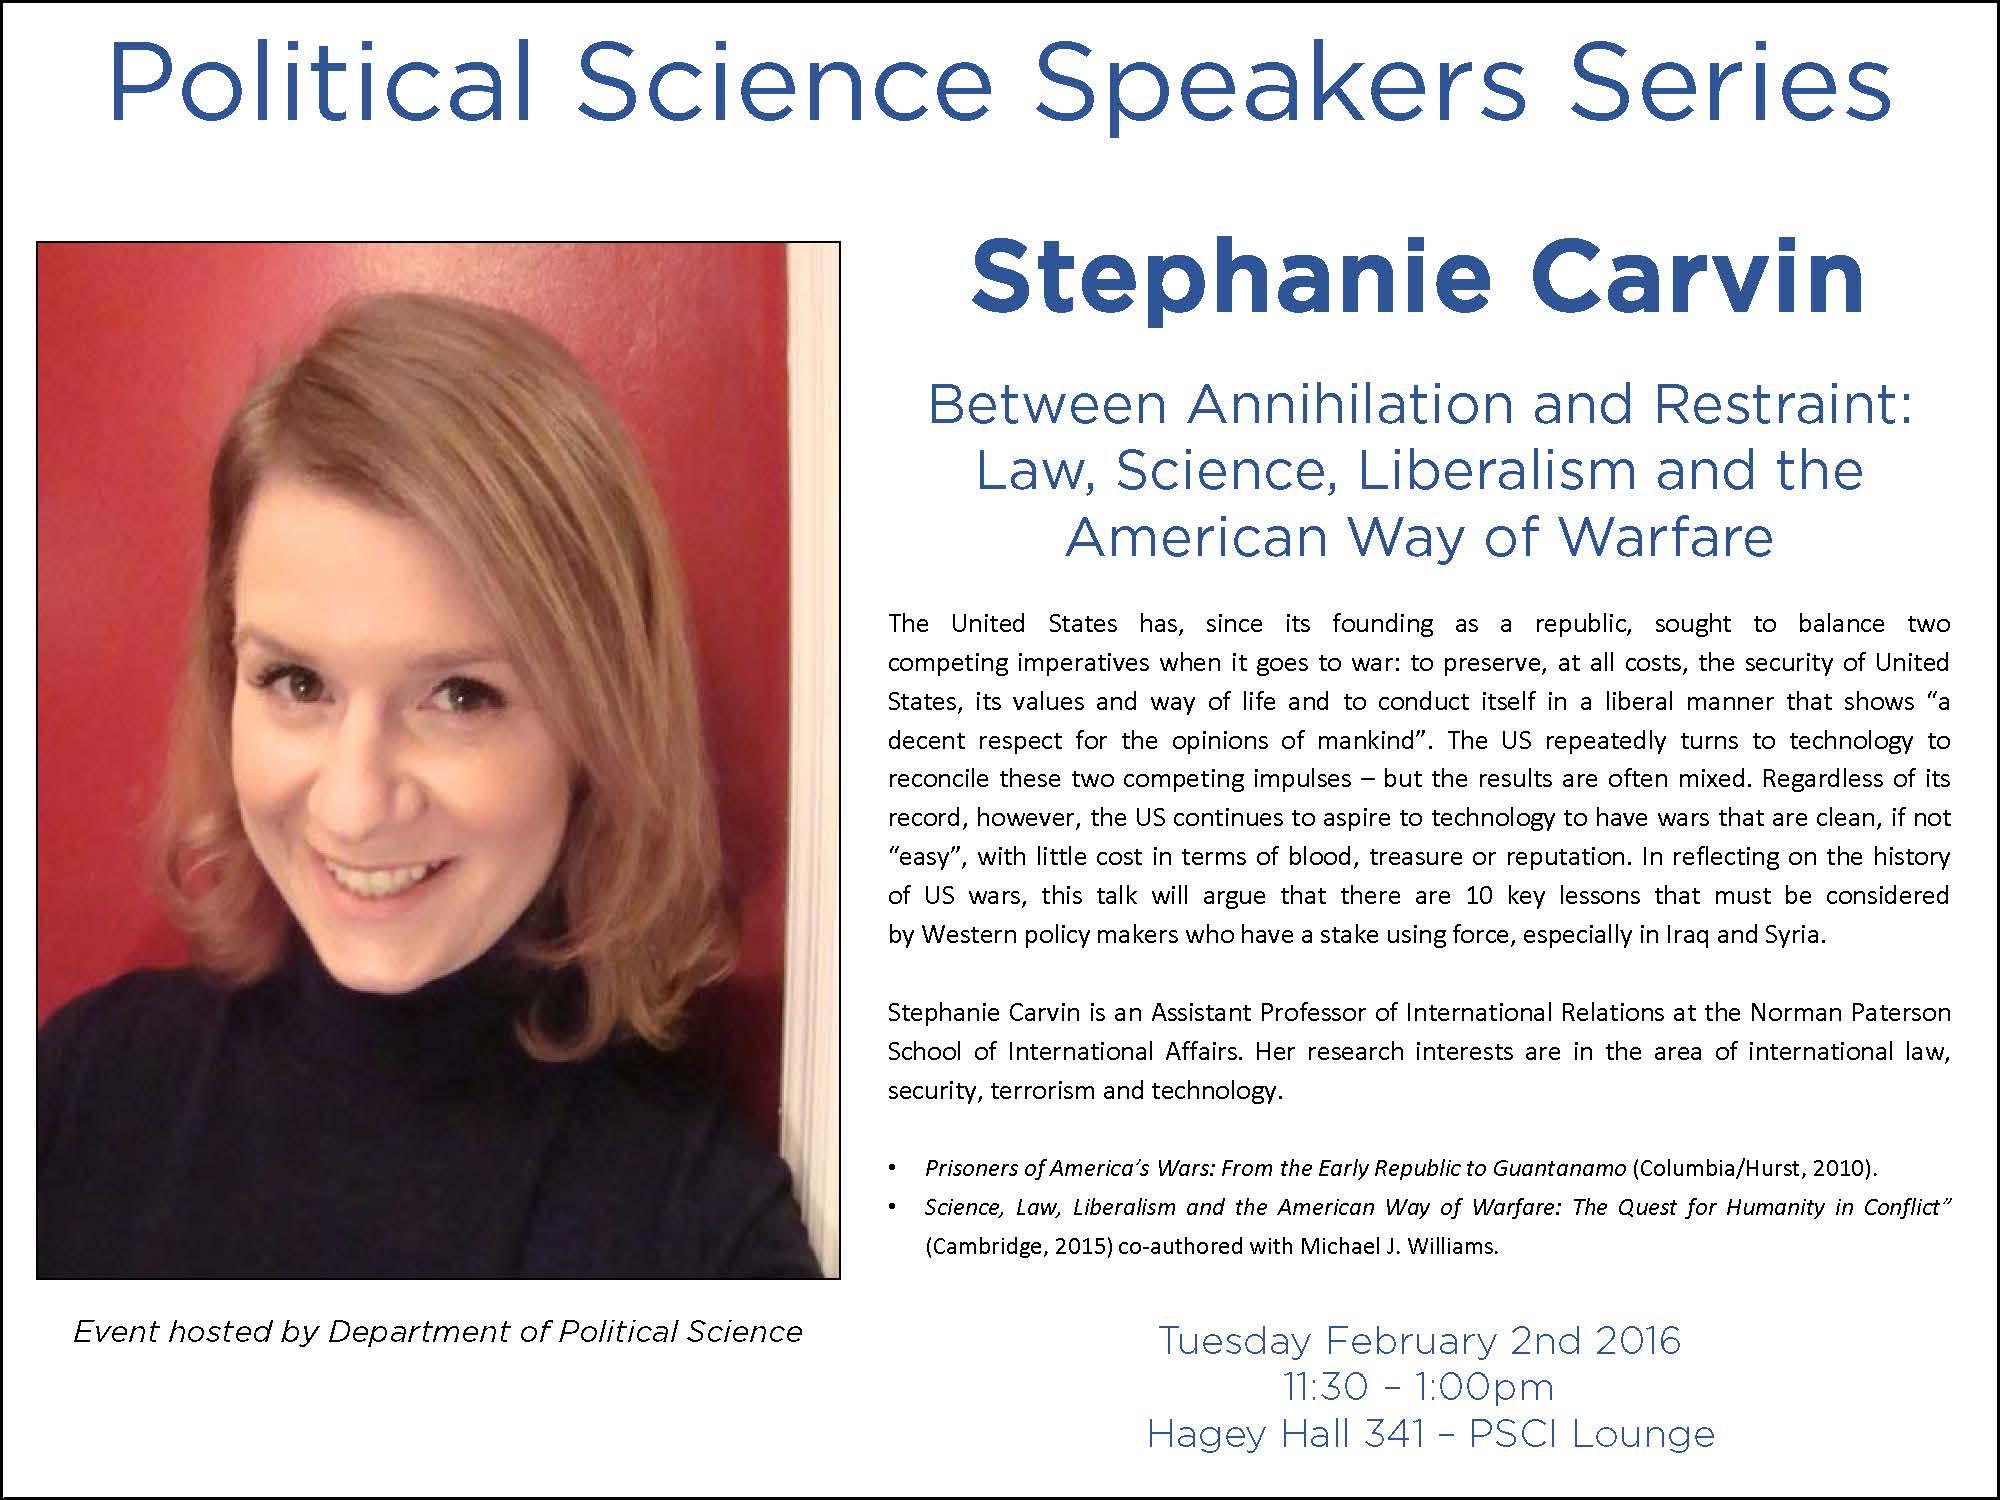 Stephanie Carvin